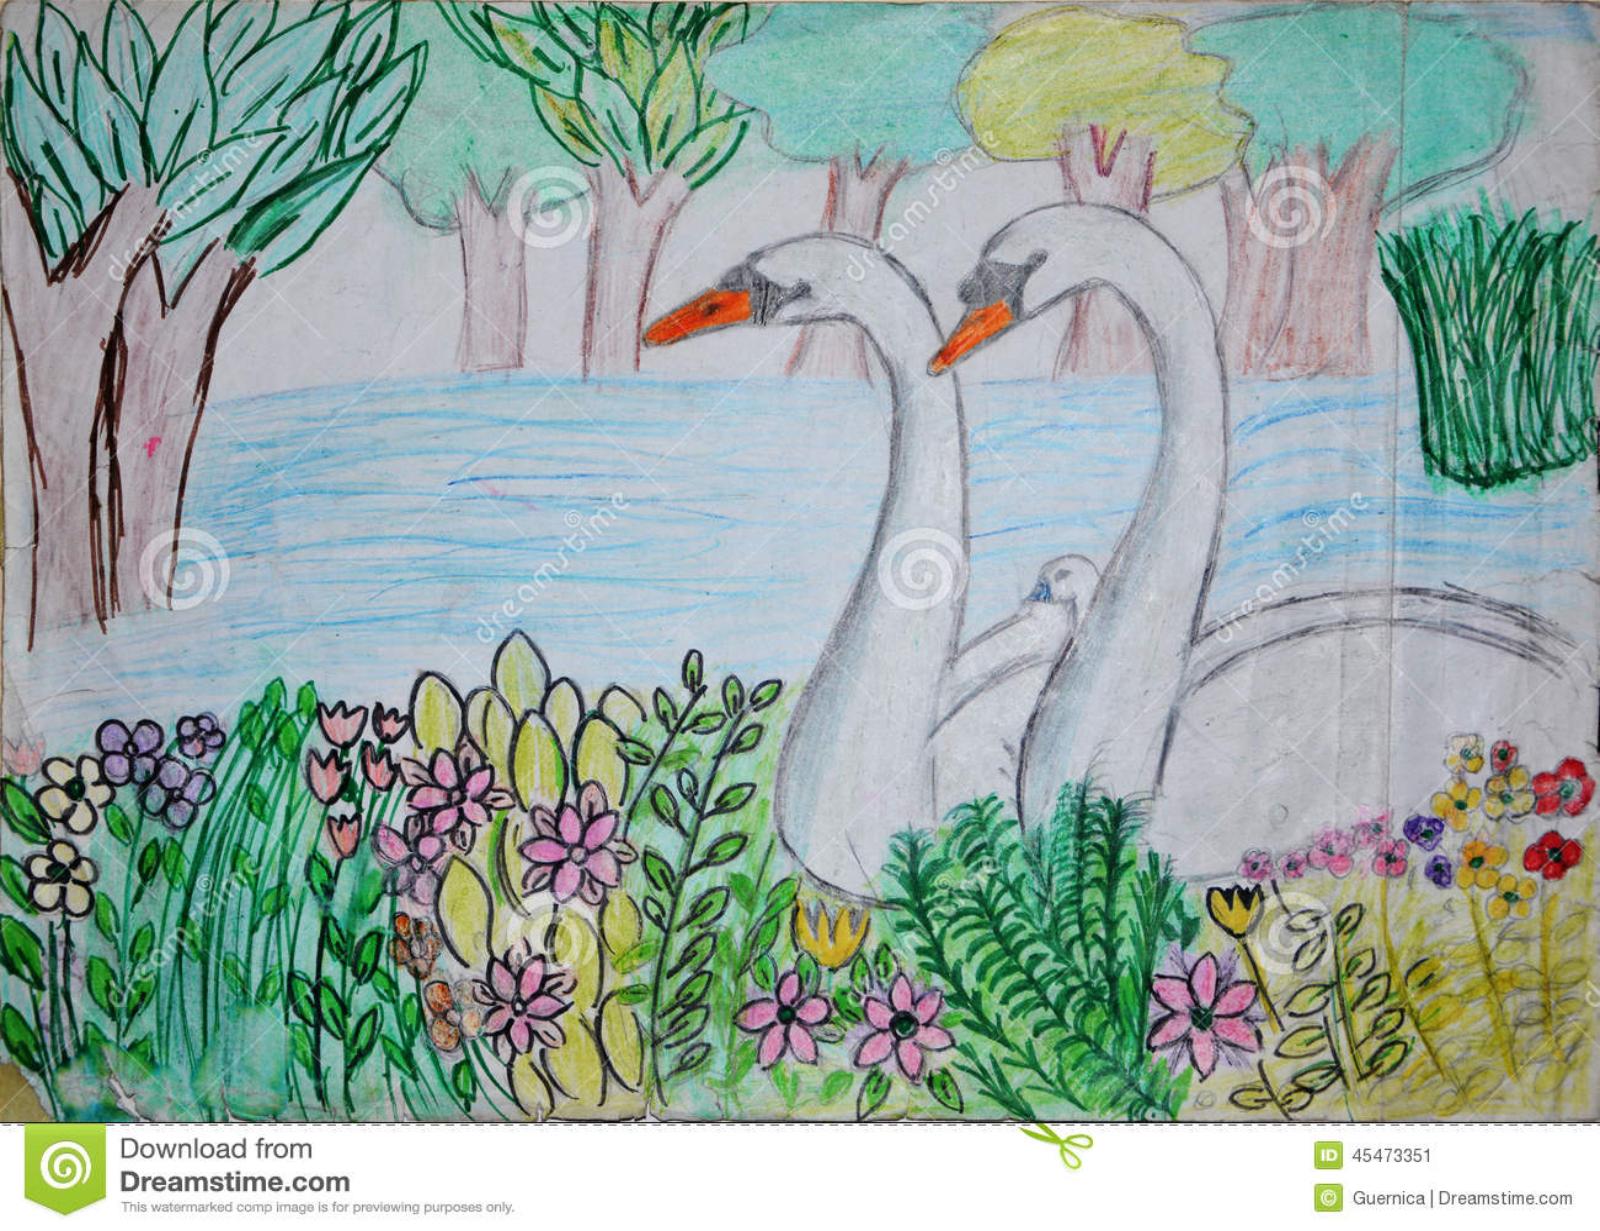 Nakreslenie Rysunek Labedzi Jezioro Ilustracji Ilustracja Zlozonej Z Kresk Temu 45473351